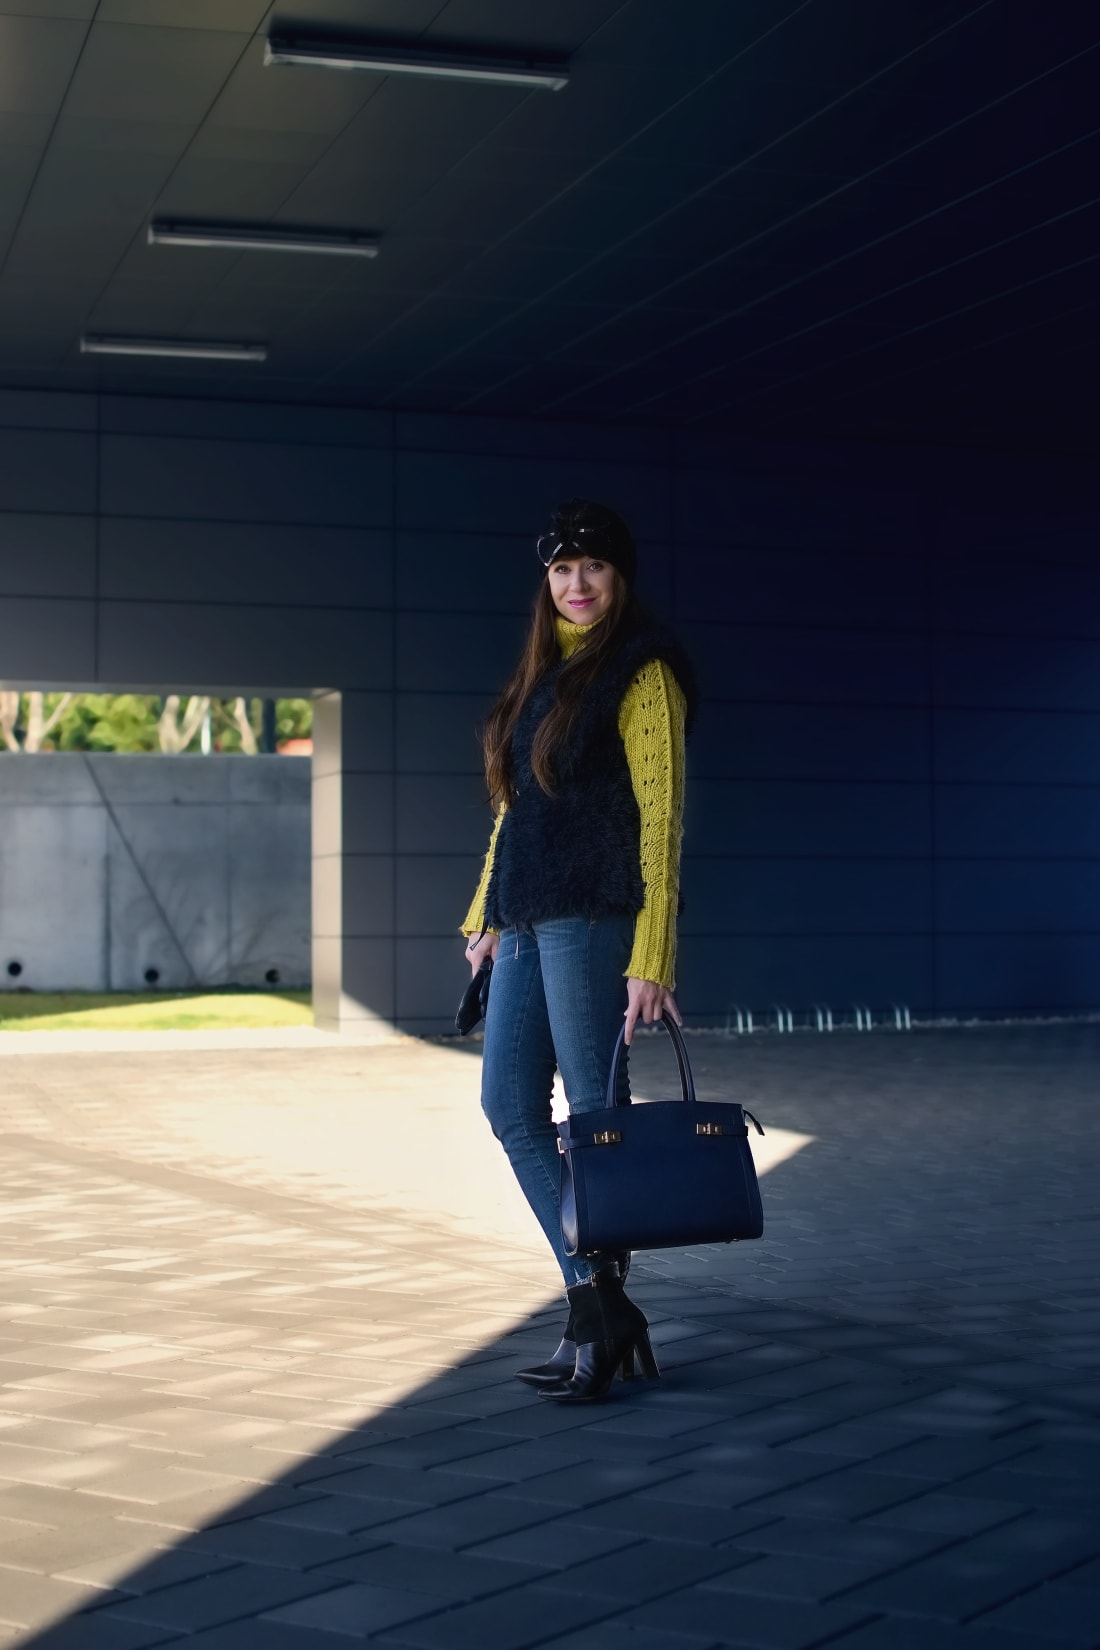 IRRESISTIBLE ME_Katharine-fashion is beautiful_blog 1_hair extension_irresistible me_beauty_Modrá kožušinová vesta_Katarína Jakubčová_Fashion blogger